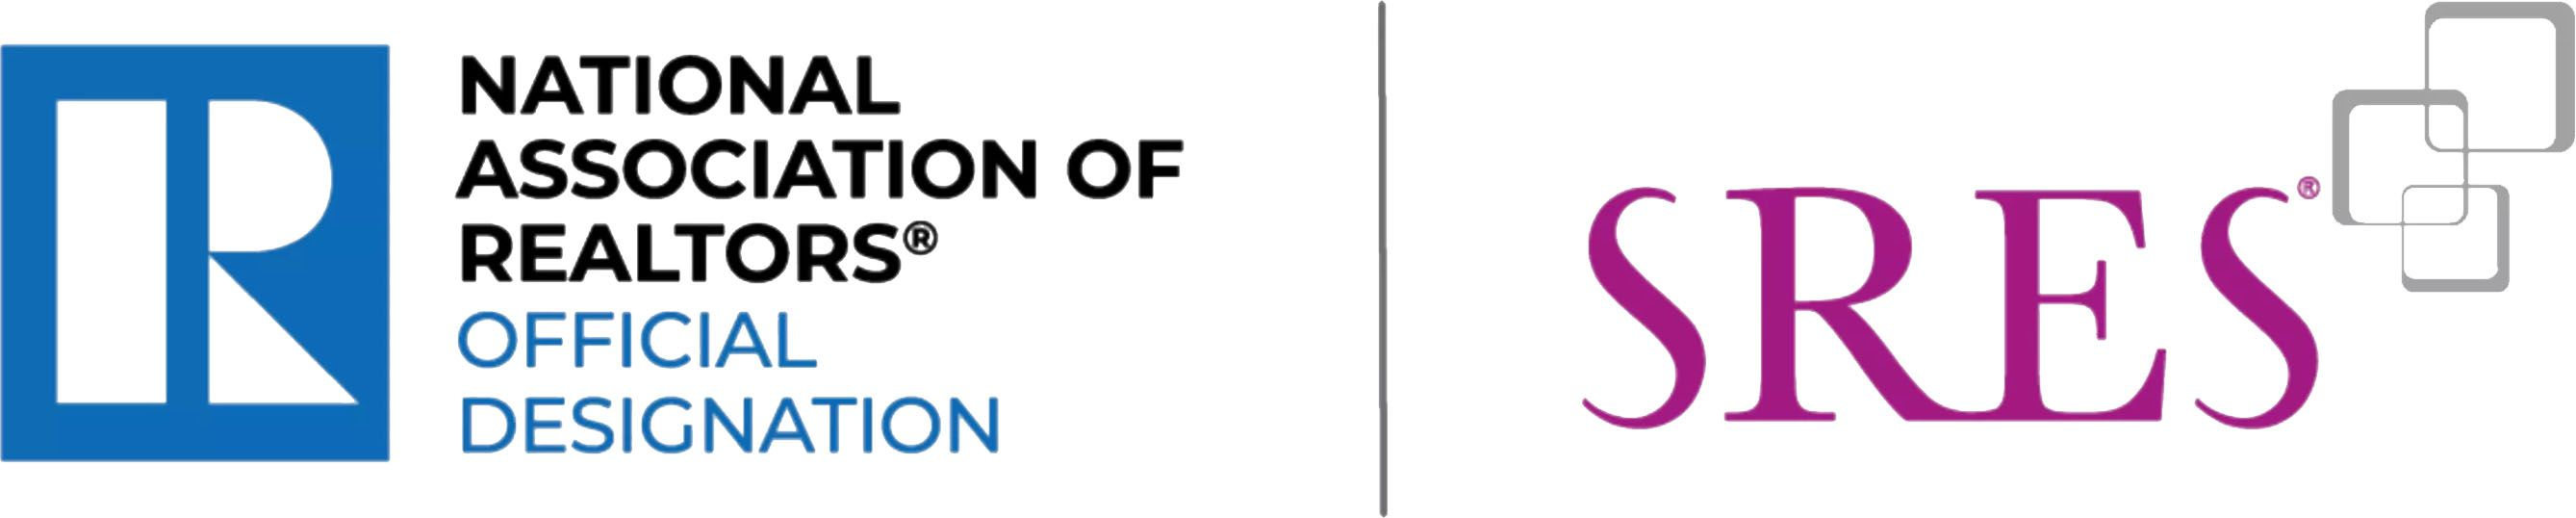 National Association of Realtors Official Designation SRES